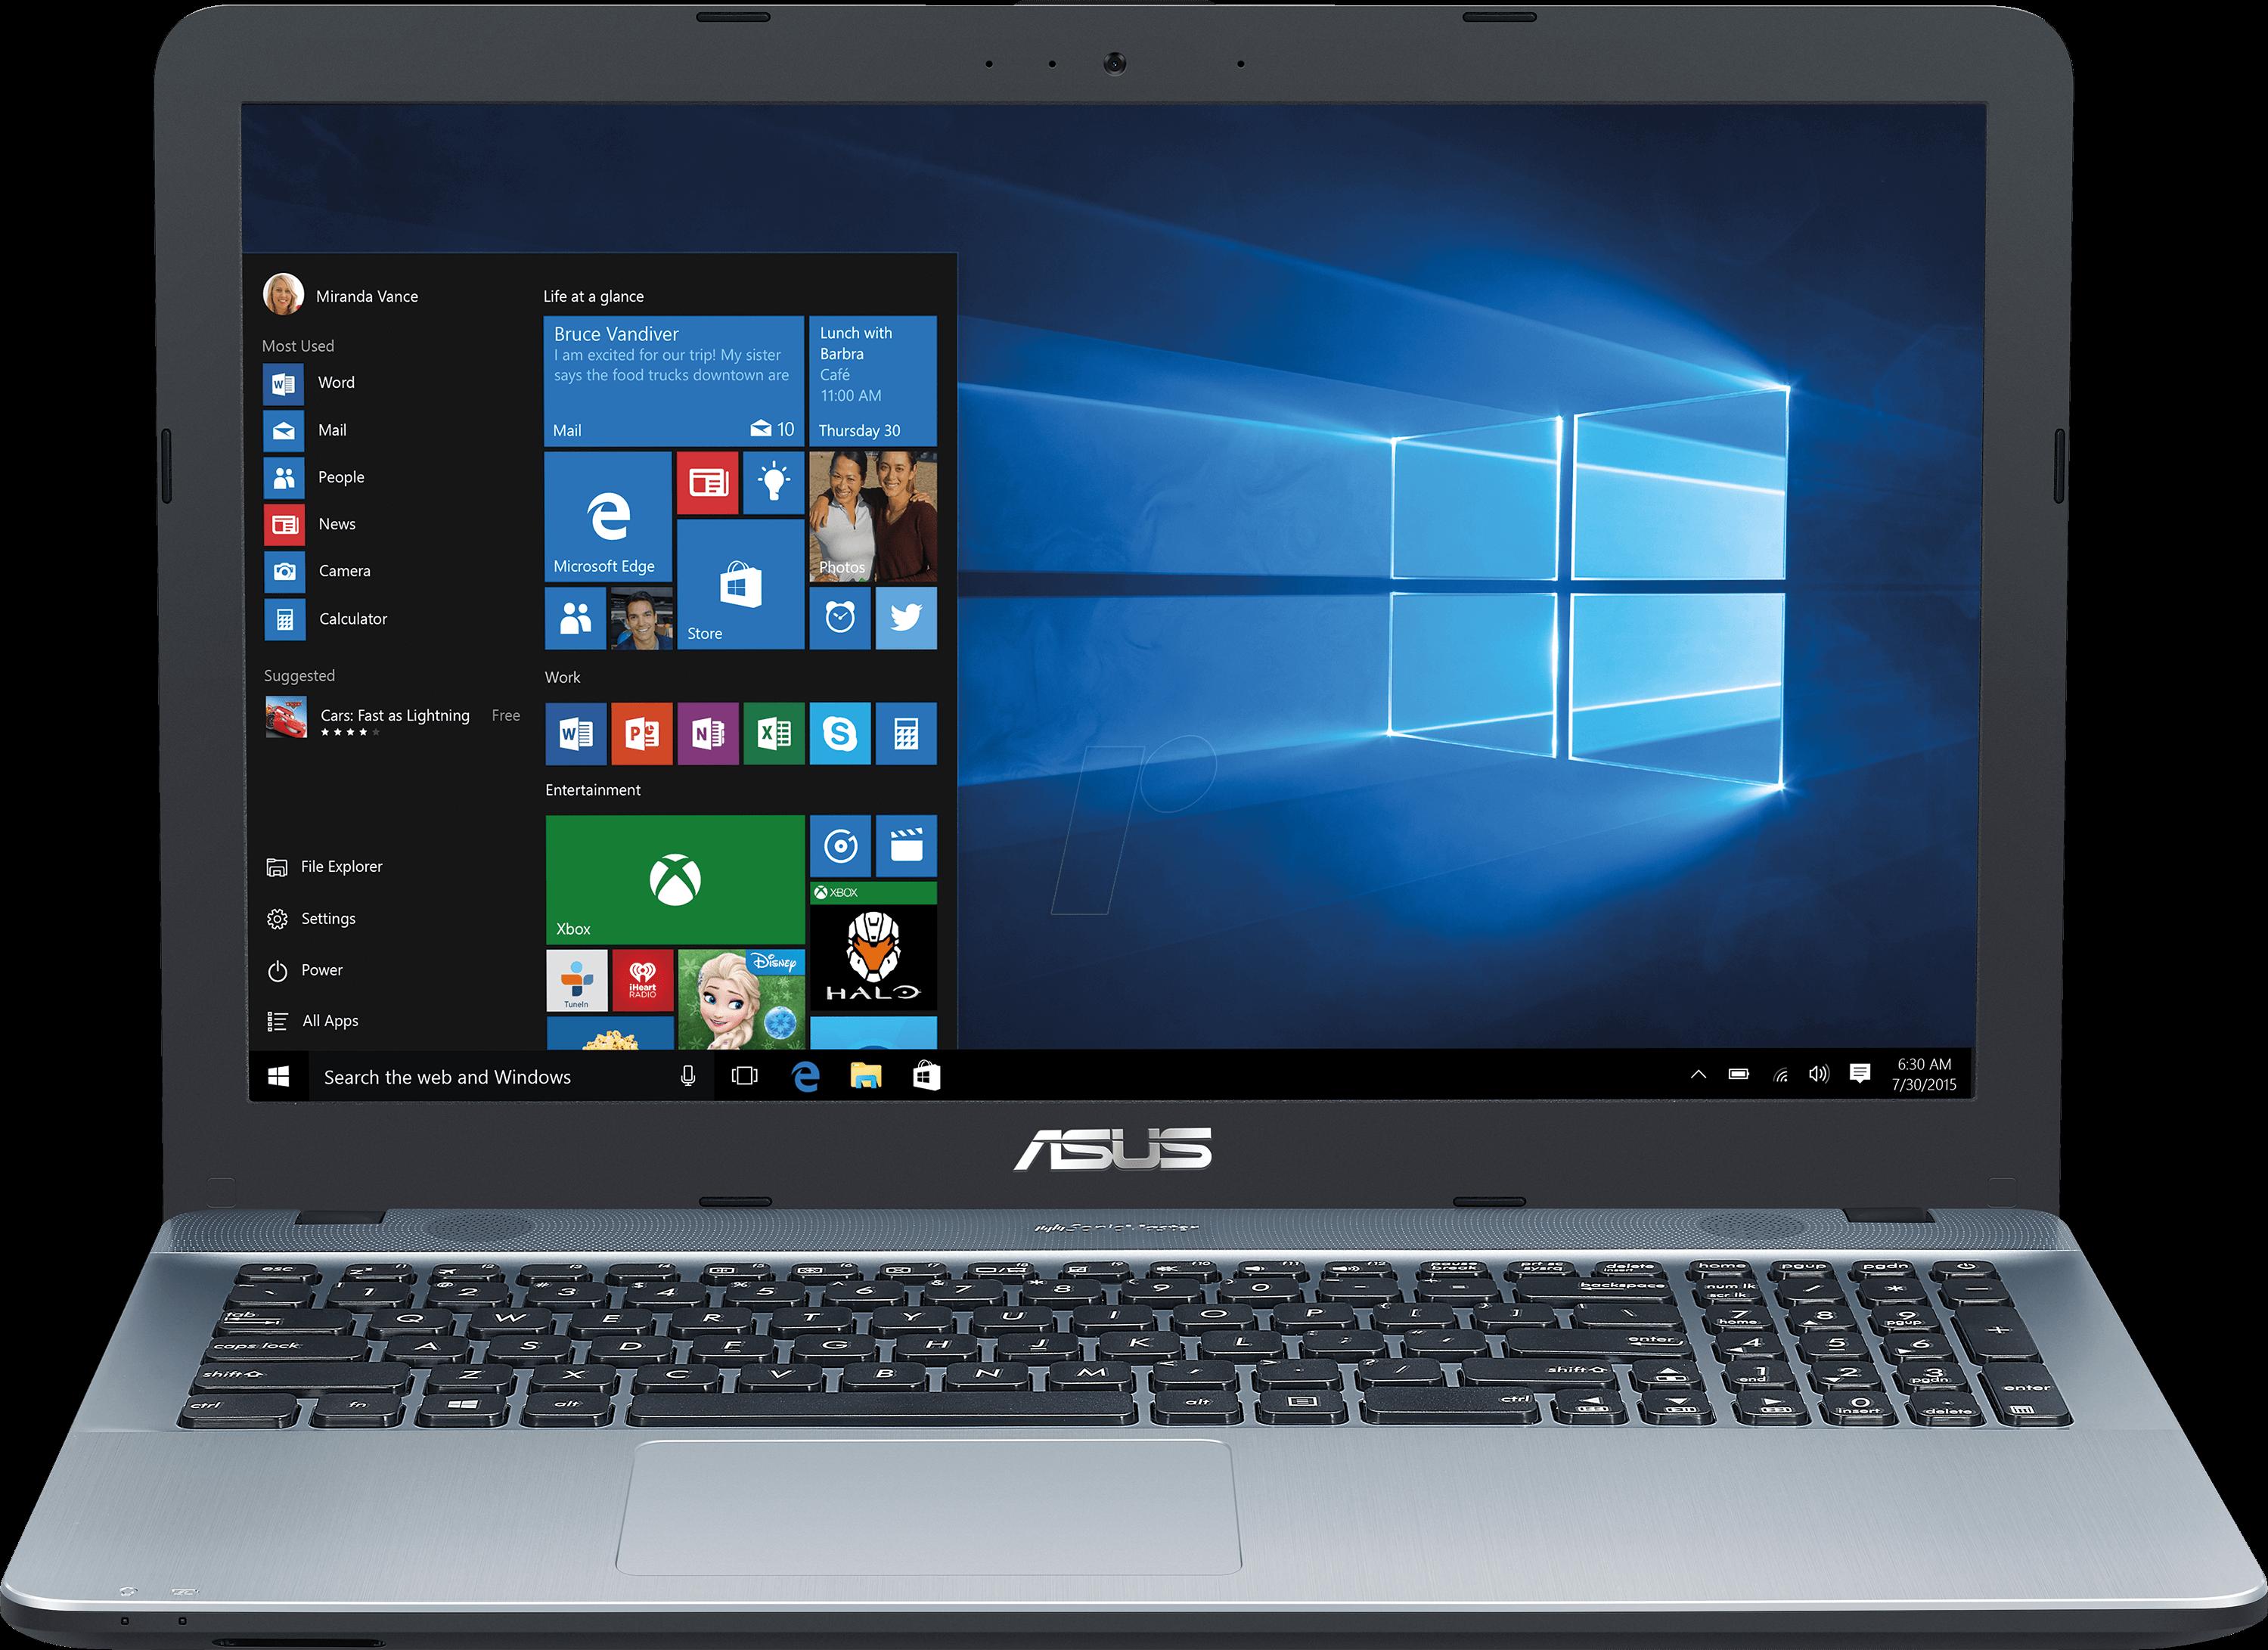 ASUS X541UA-GQ1T - Laptop, VIVOBOOK X541UA, Win...